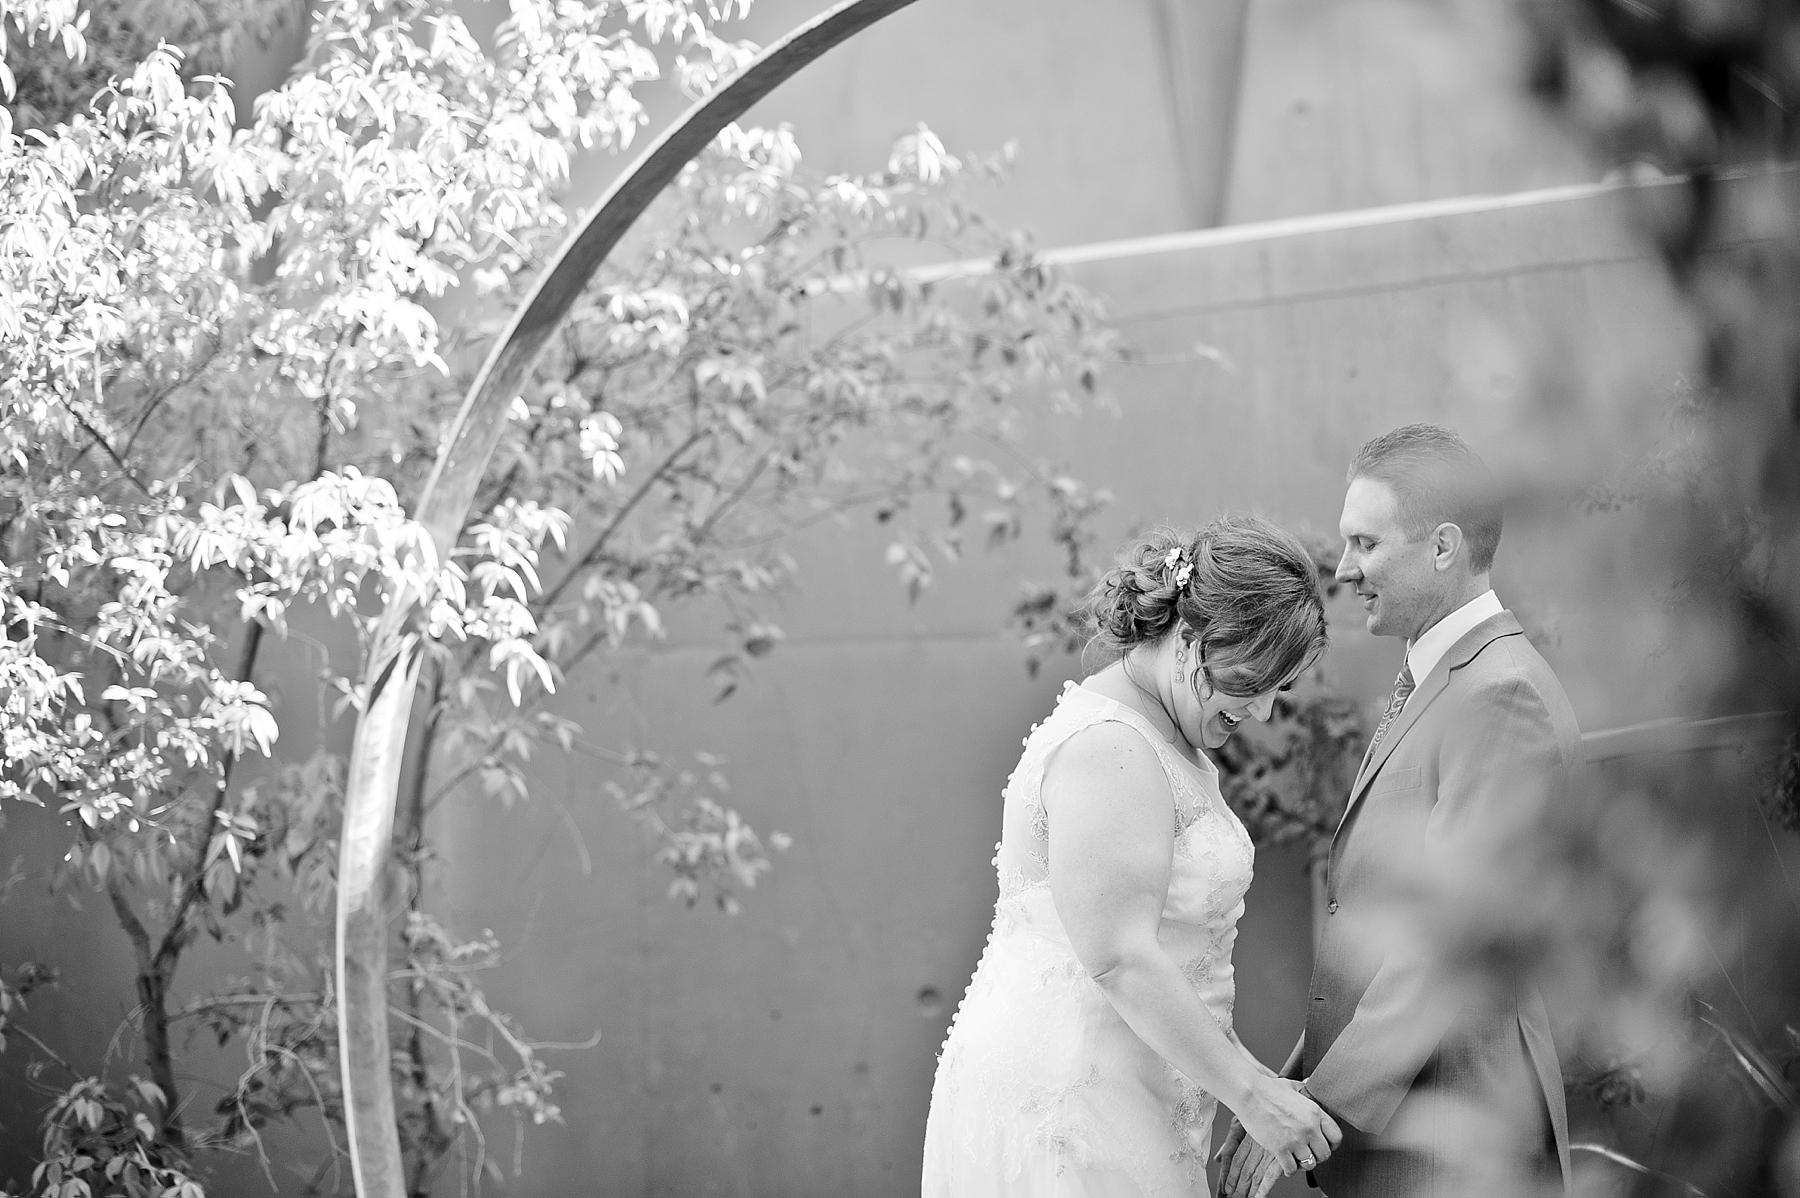 springs_preserve_las_vegas_wedding_photos-10.jpg